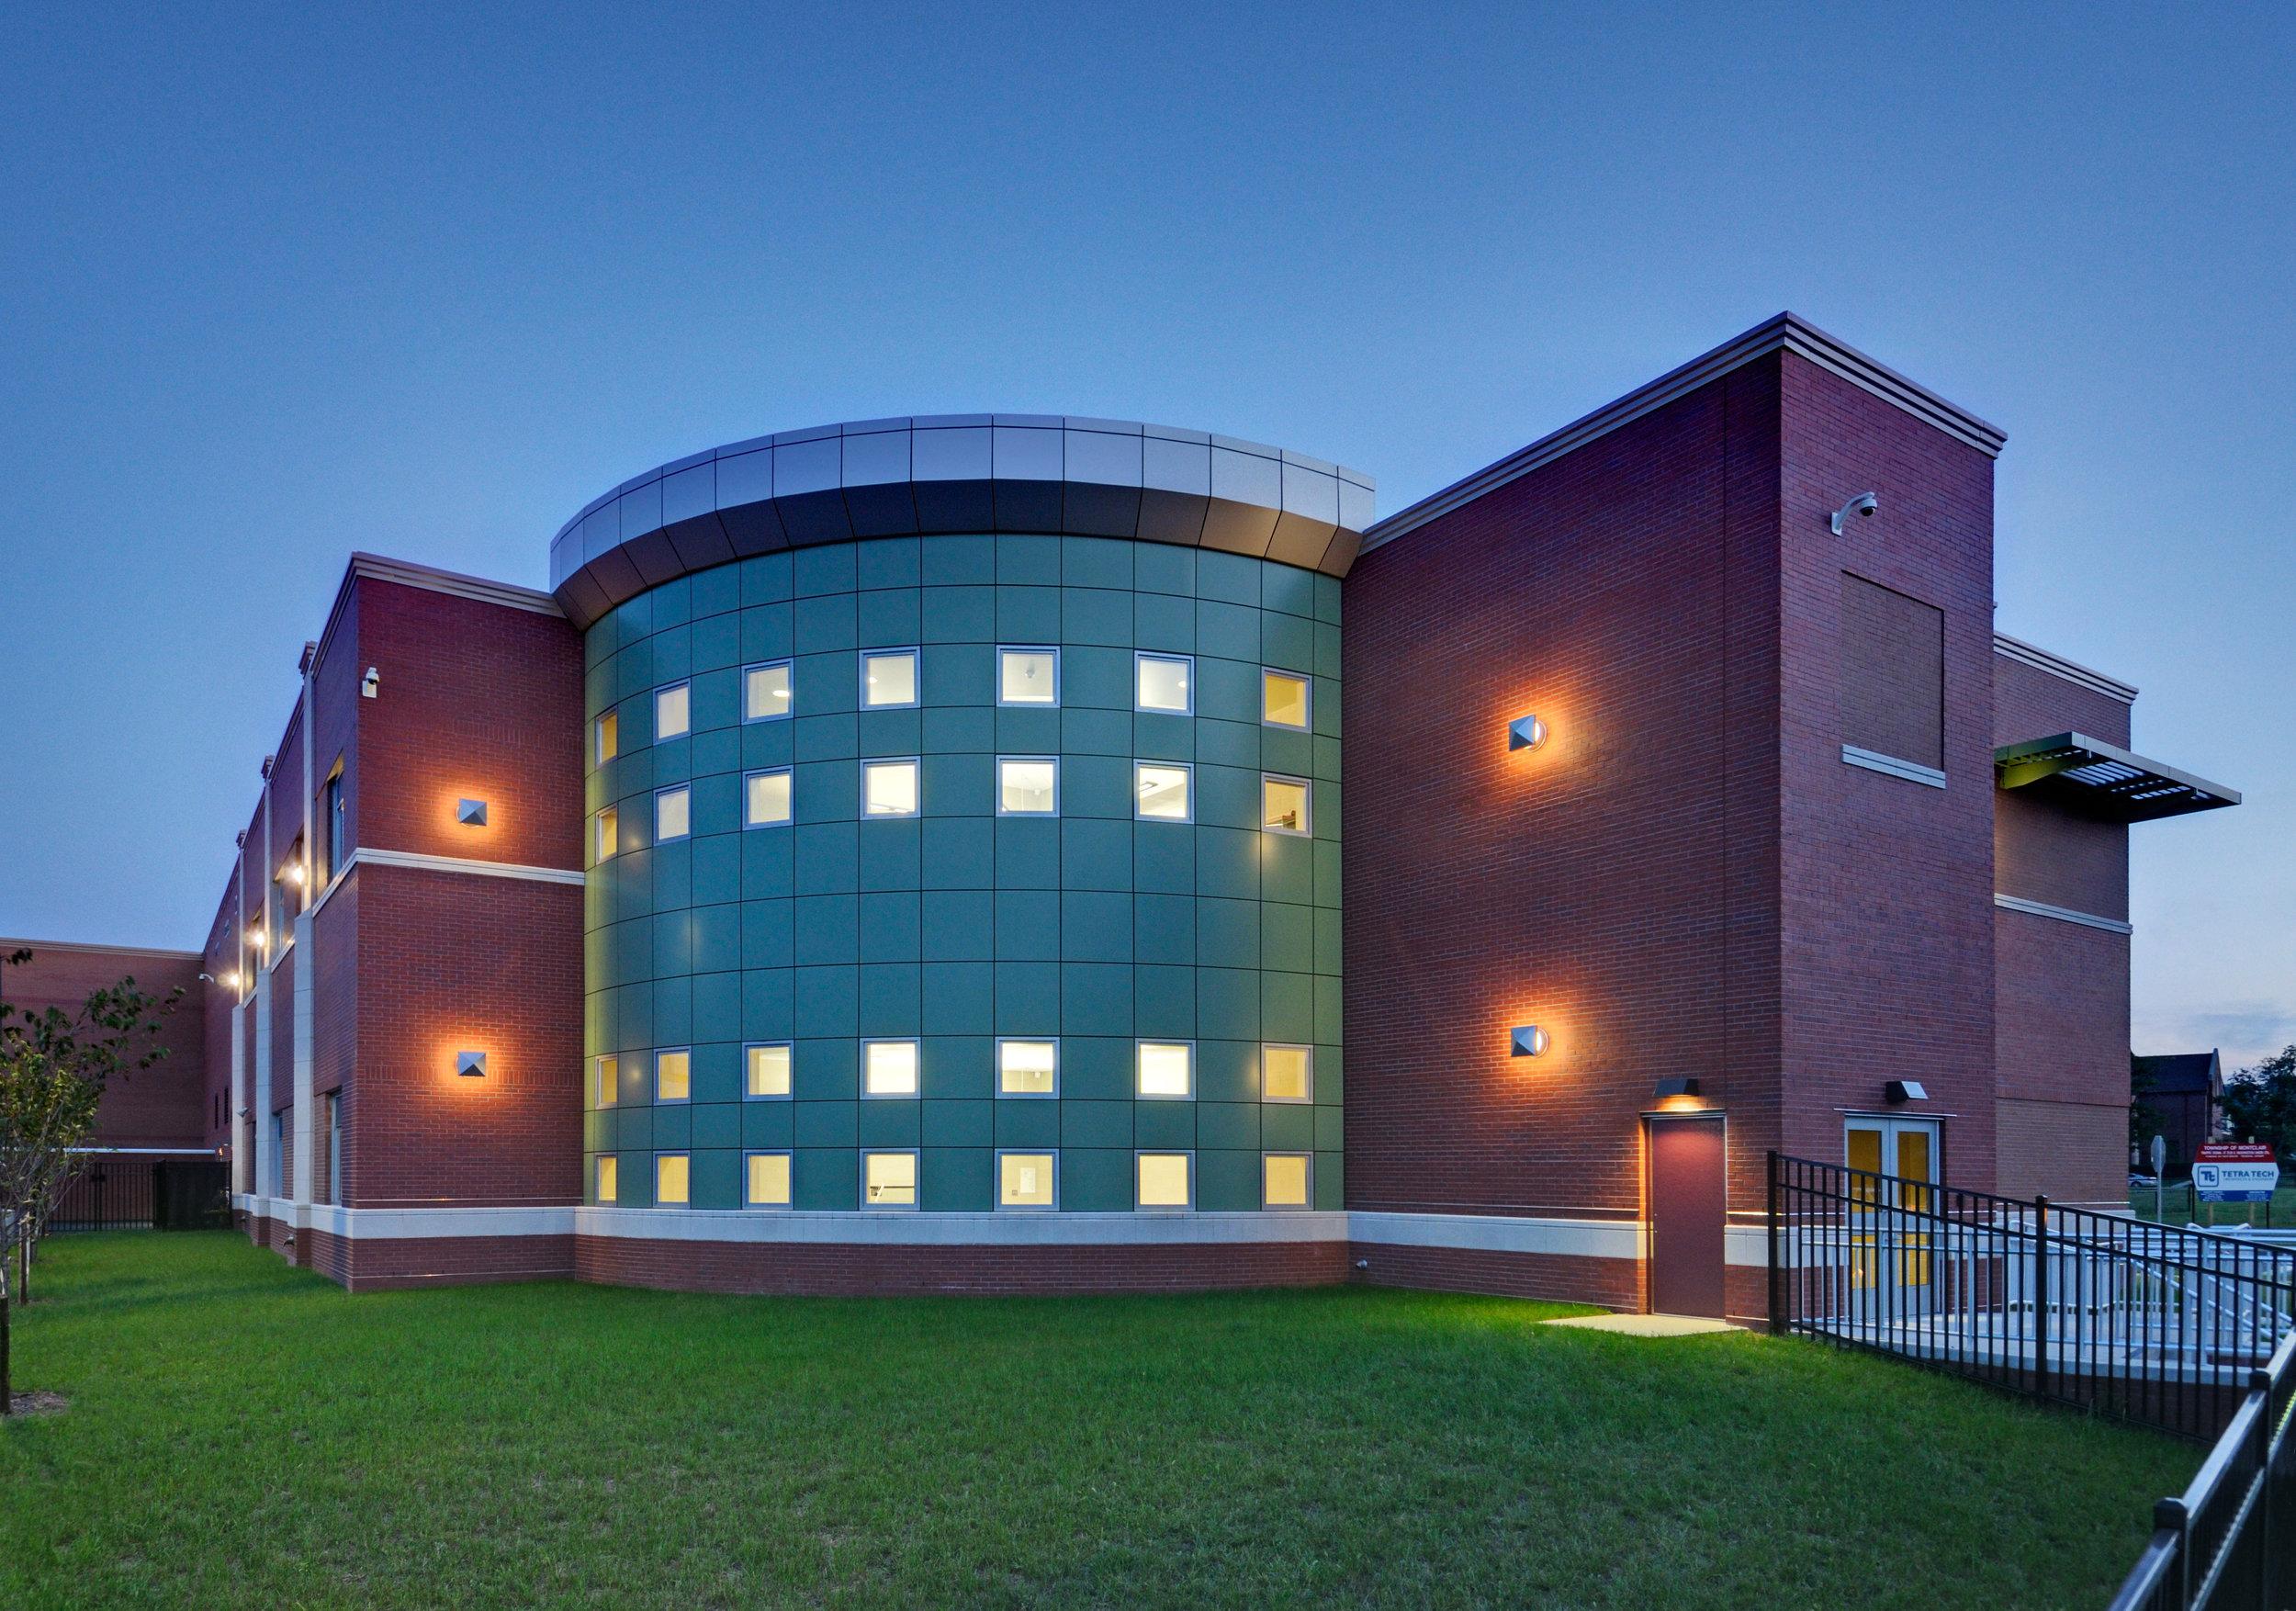 Montclaire, NJ Elementary School:LEED Certifiable